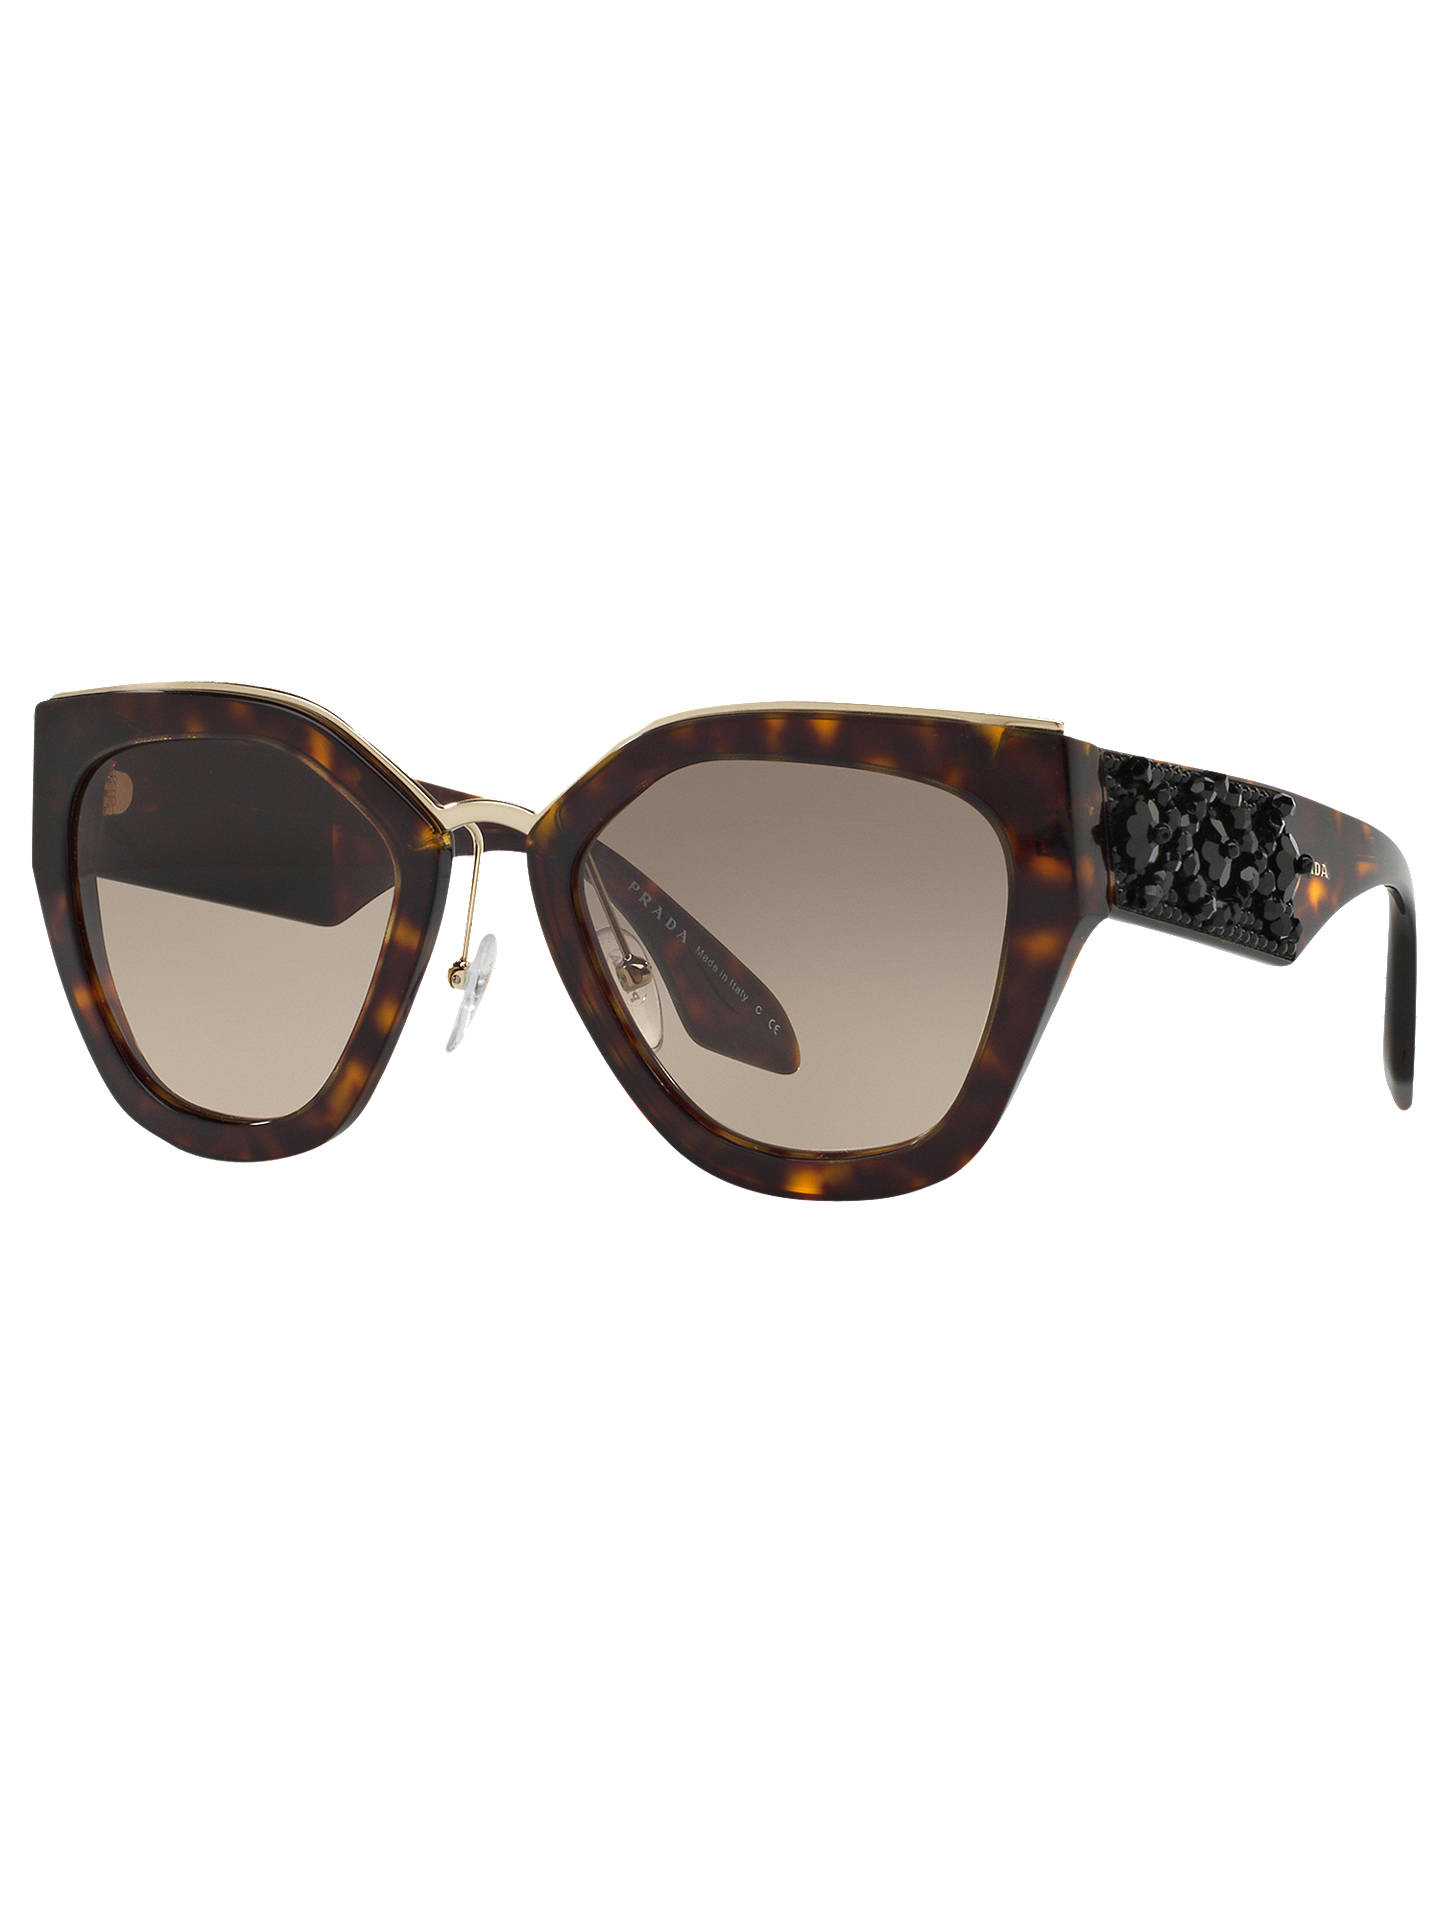 b0bcfdabf634e ... norway buyprada pr 10ts embellished geometric sunglasses tortoise brown  gradient online at johnlewis e952d 6f64d get amazon new prada ...